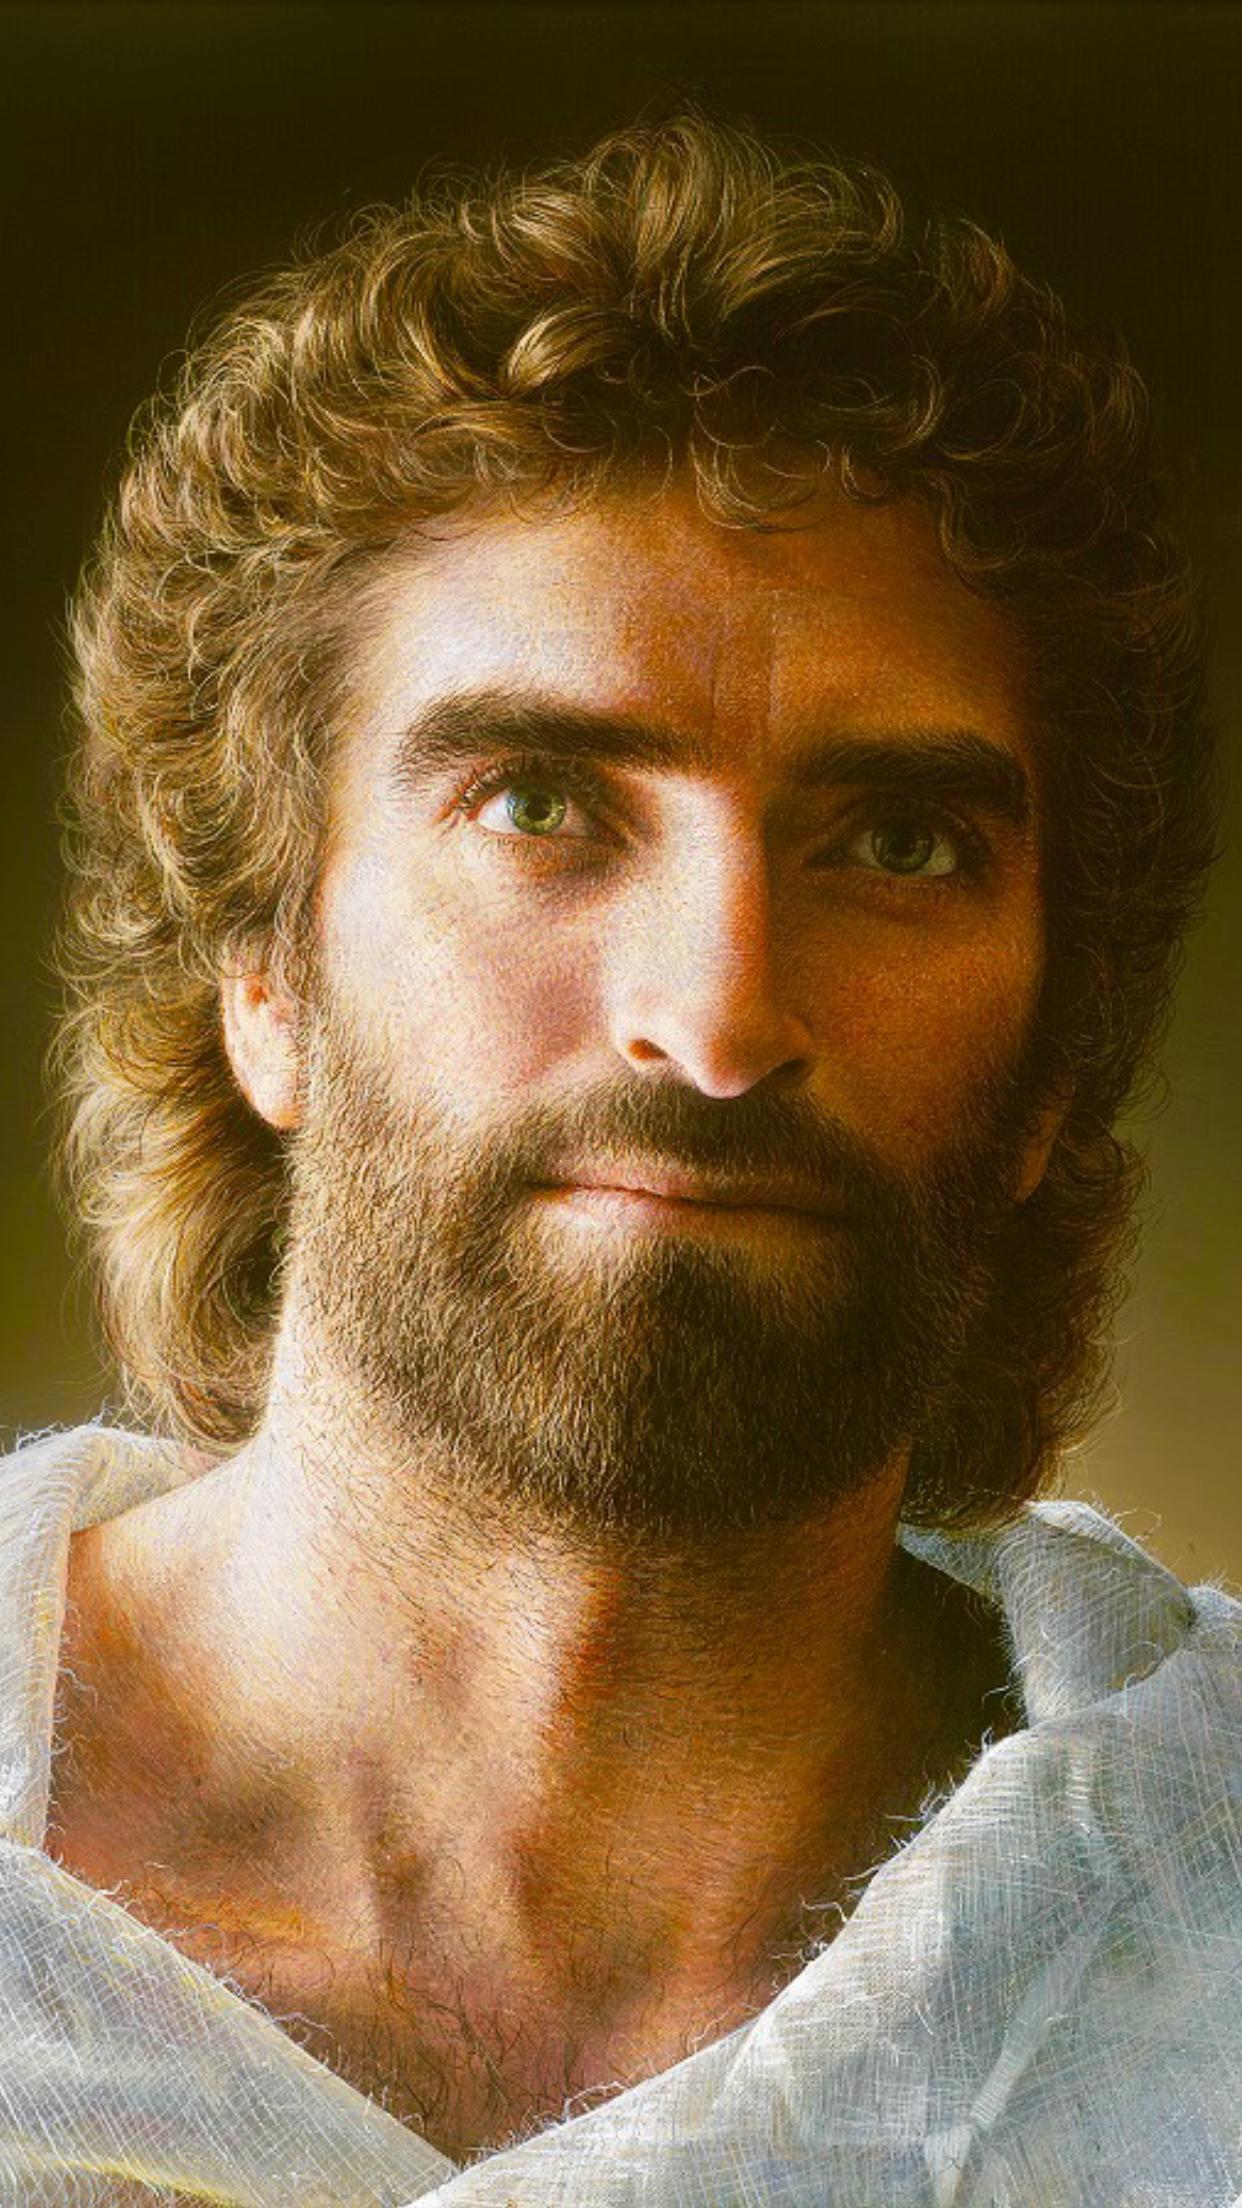 jesus christ unwavering faith unconditional love and eternal